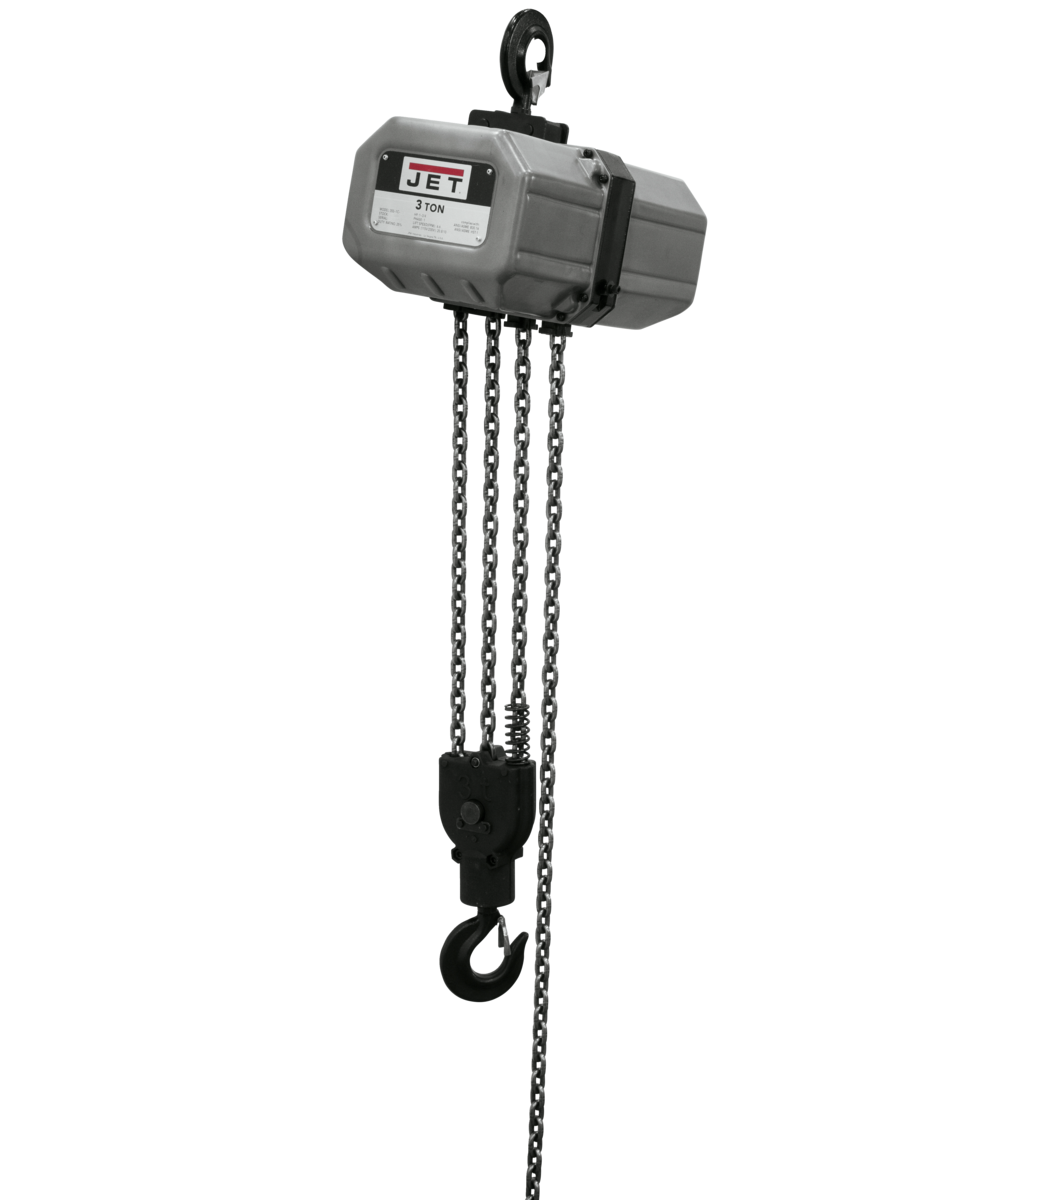 3SS-3C-15, 3-Ton Electric Chain Hoist 3-Phase 15' Lift